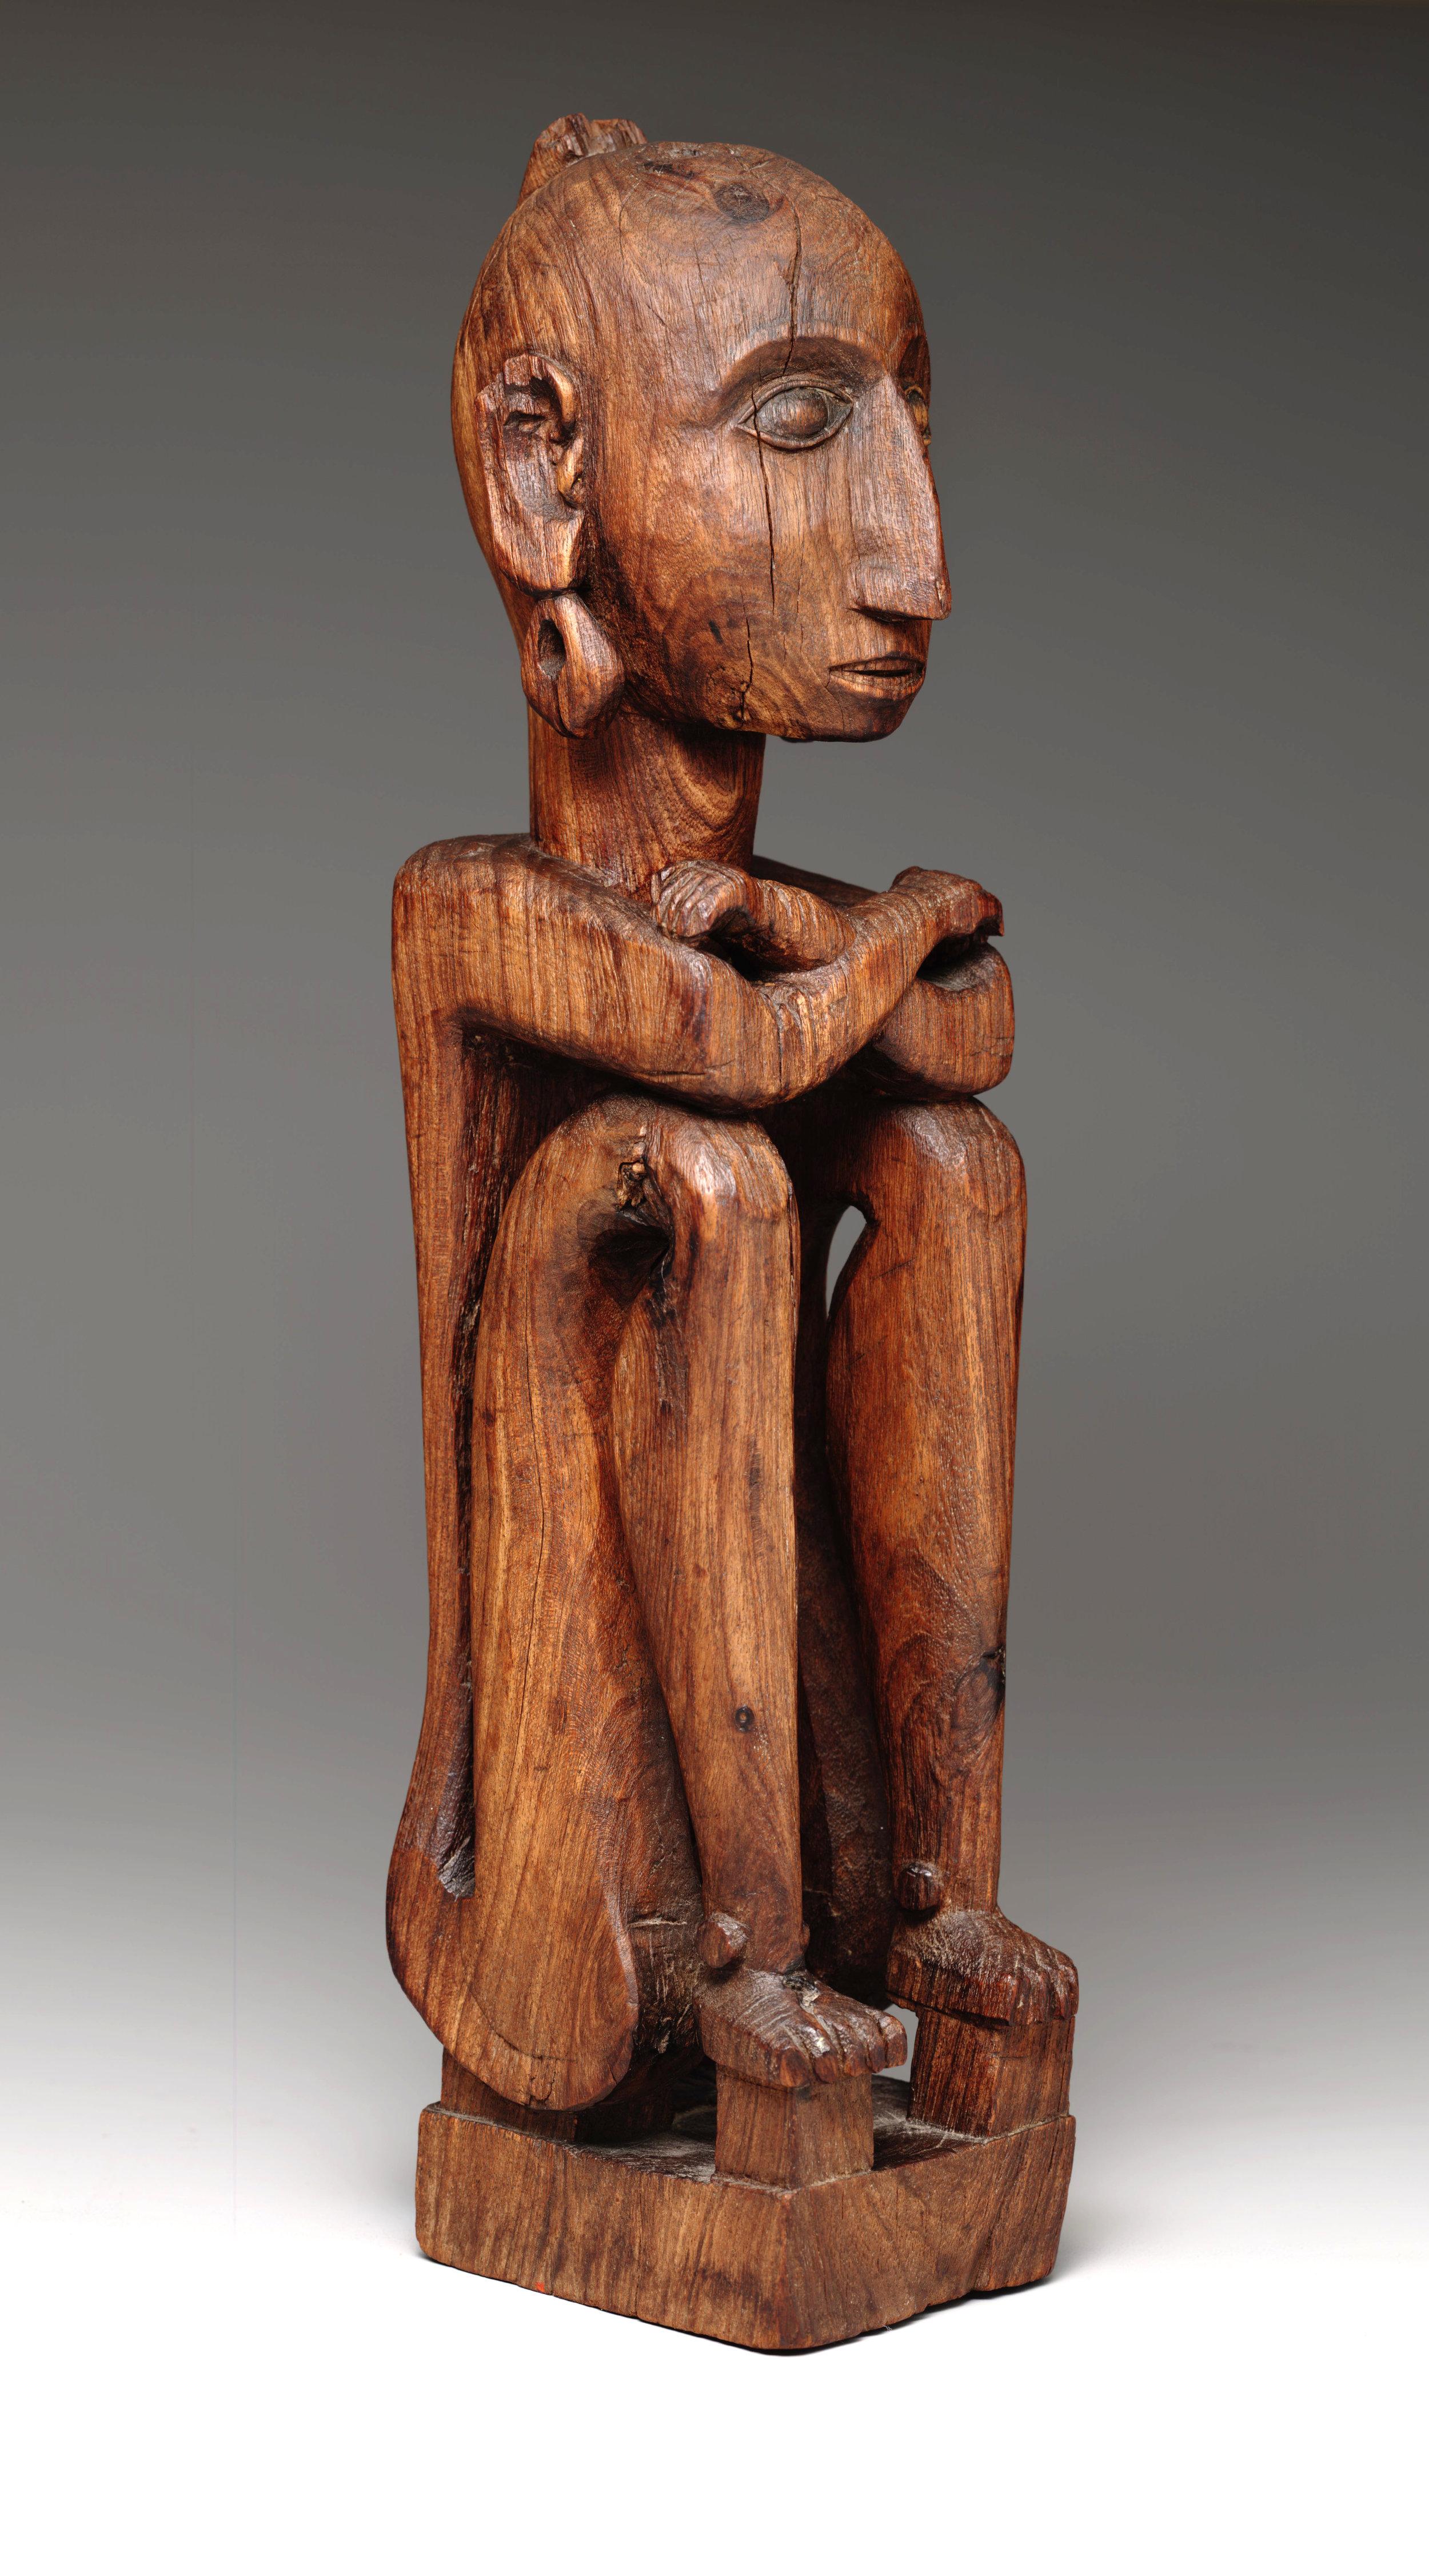 Ancestor Figure © The Dallas Museum of Art | Texas, USA